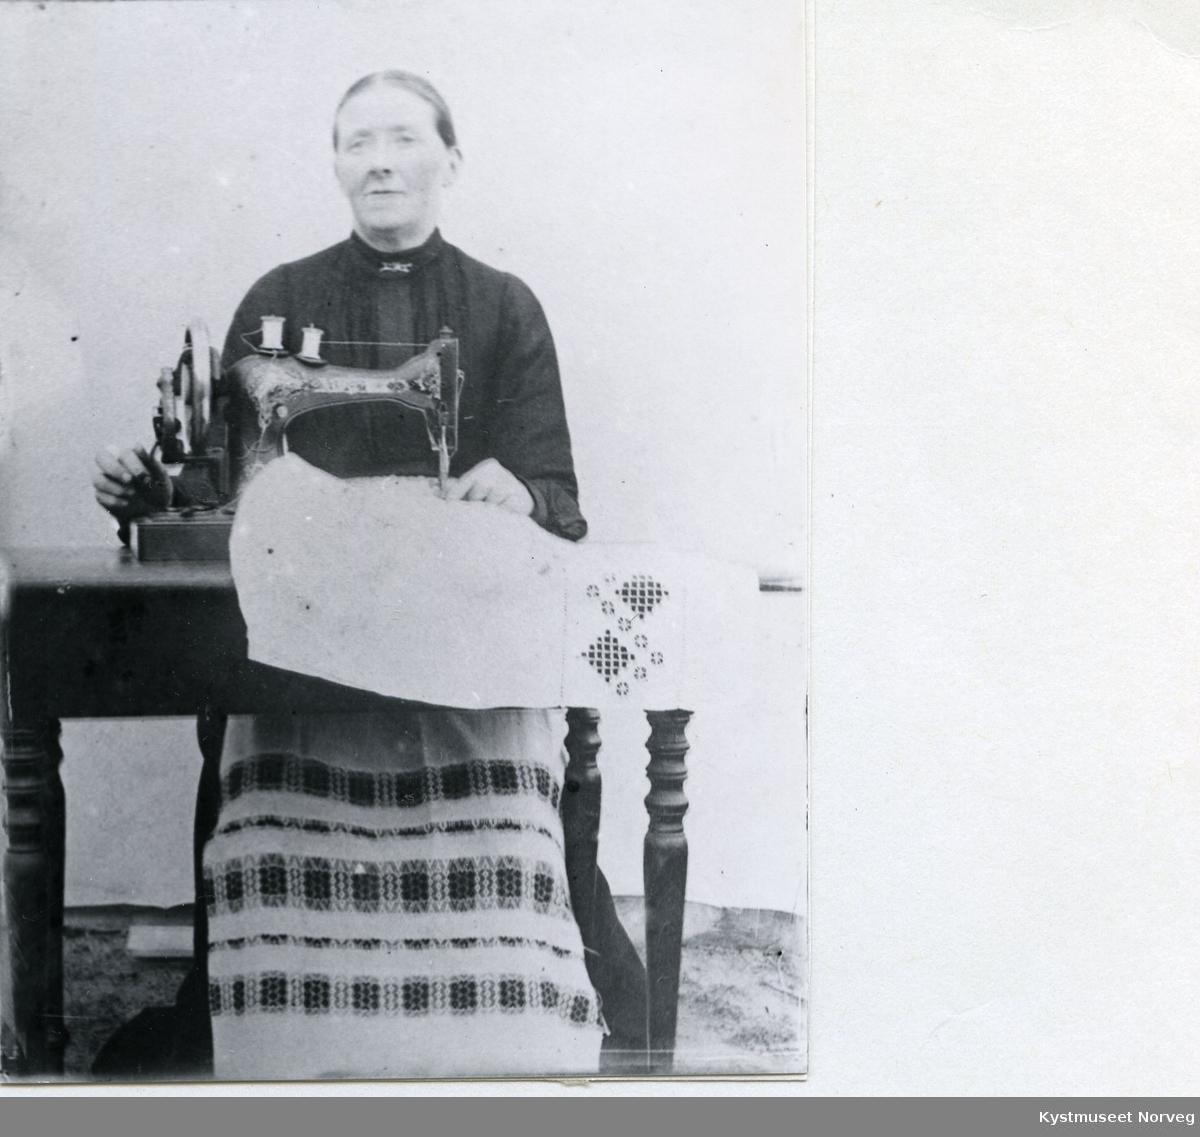 Jensine Knudsen - lintøyerske fra Egan